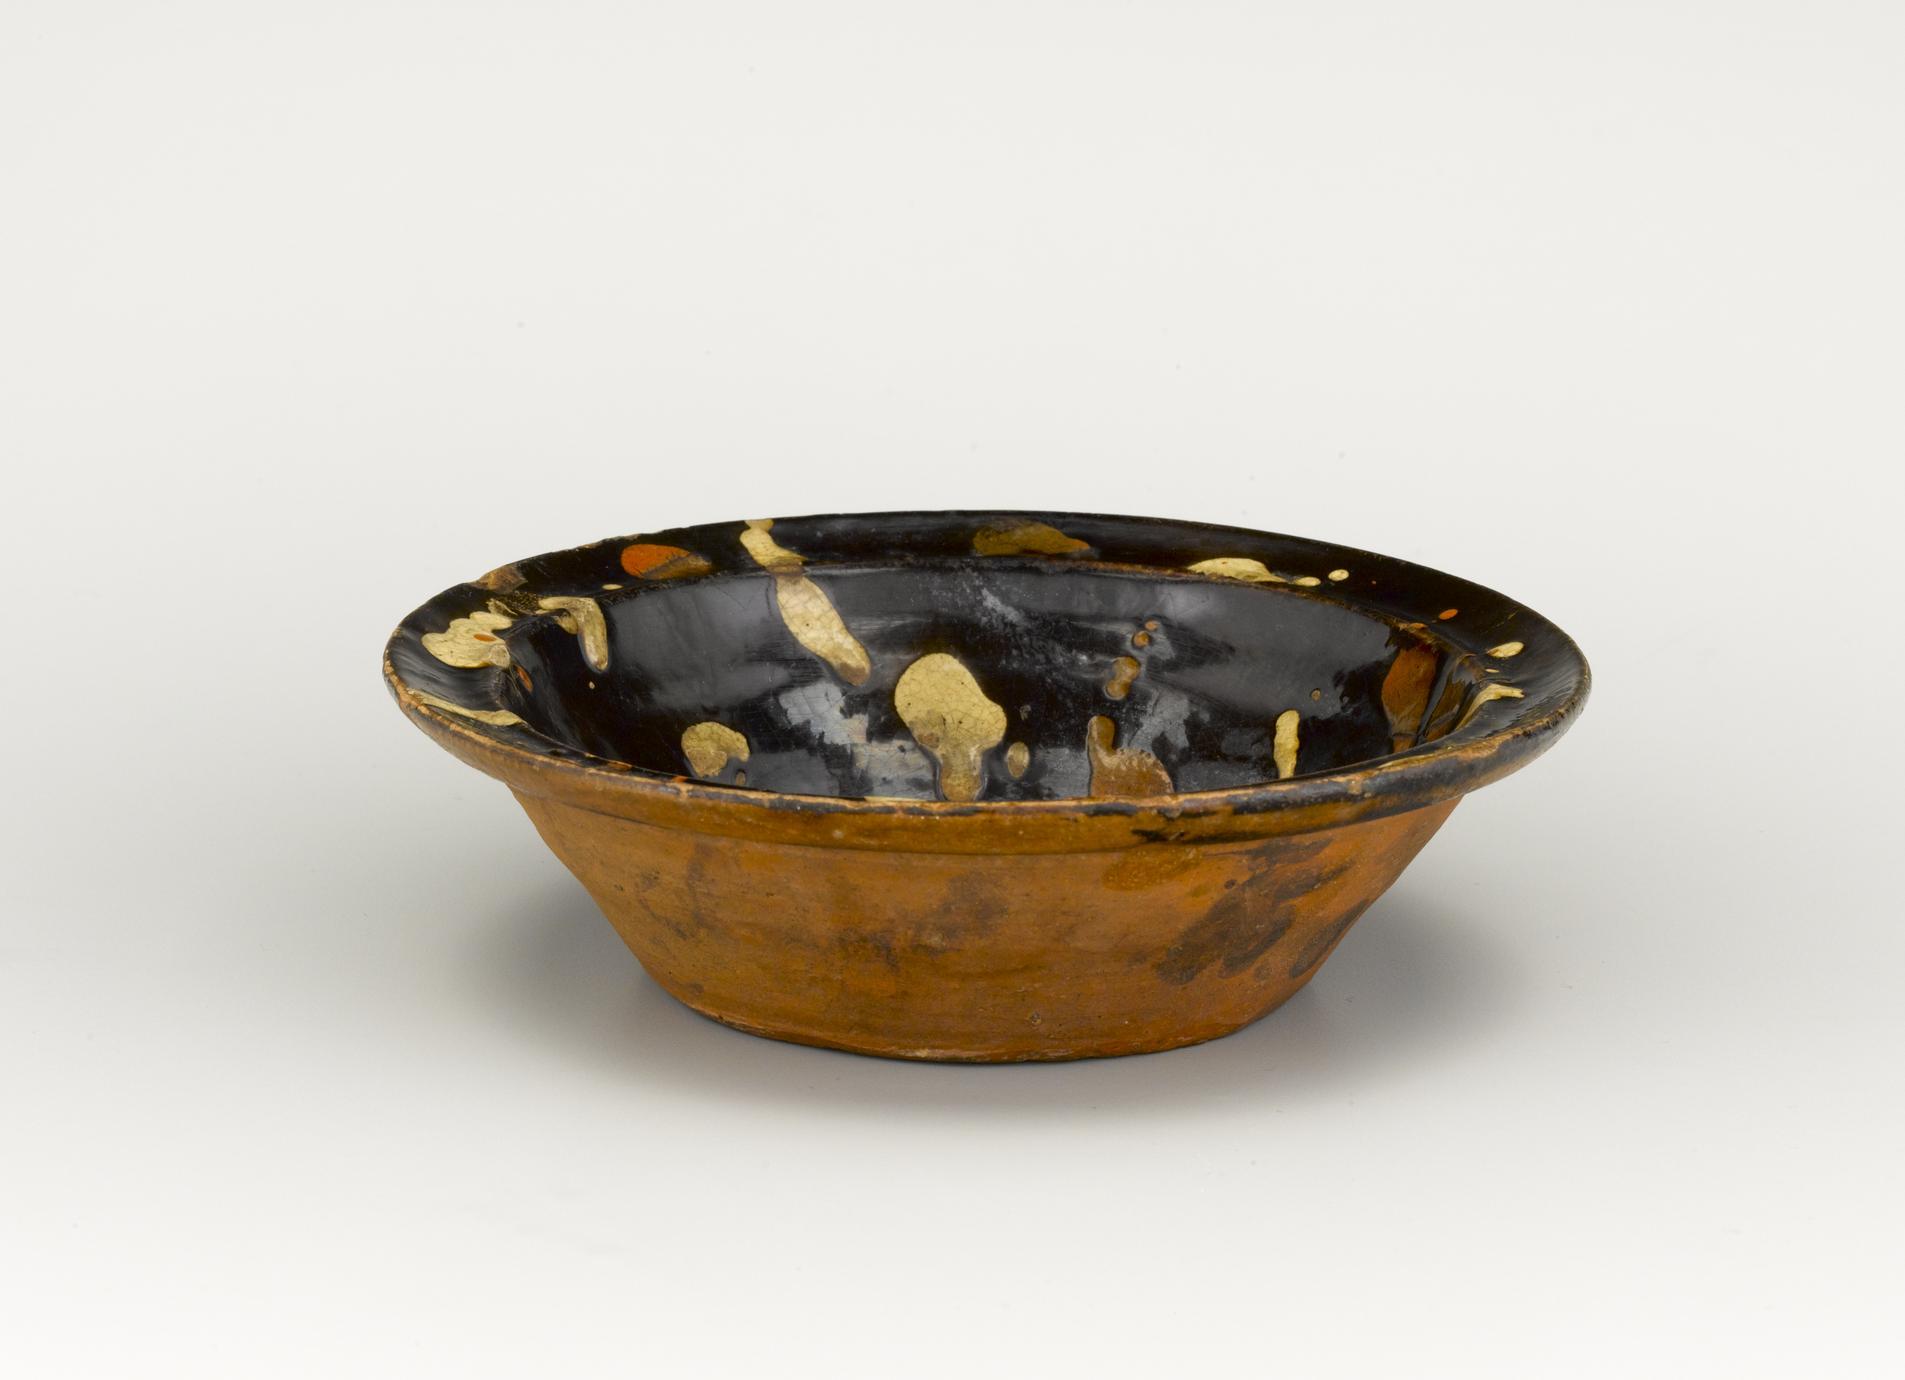 Bowl (1 of 3)